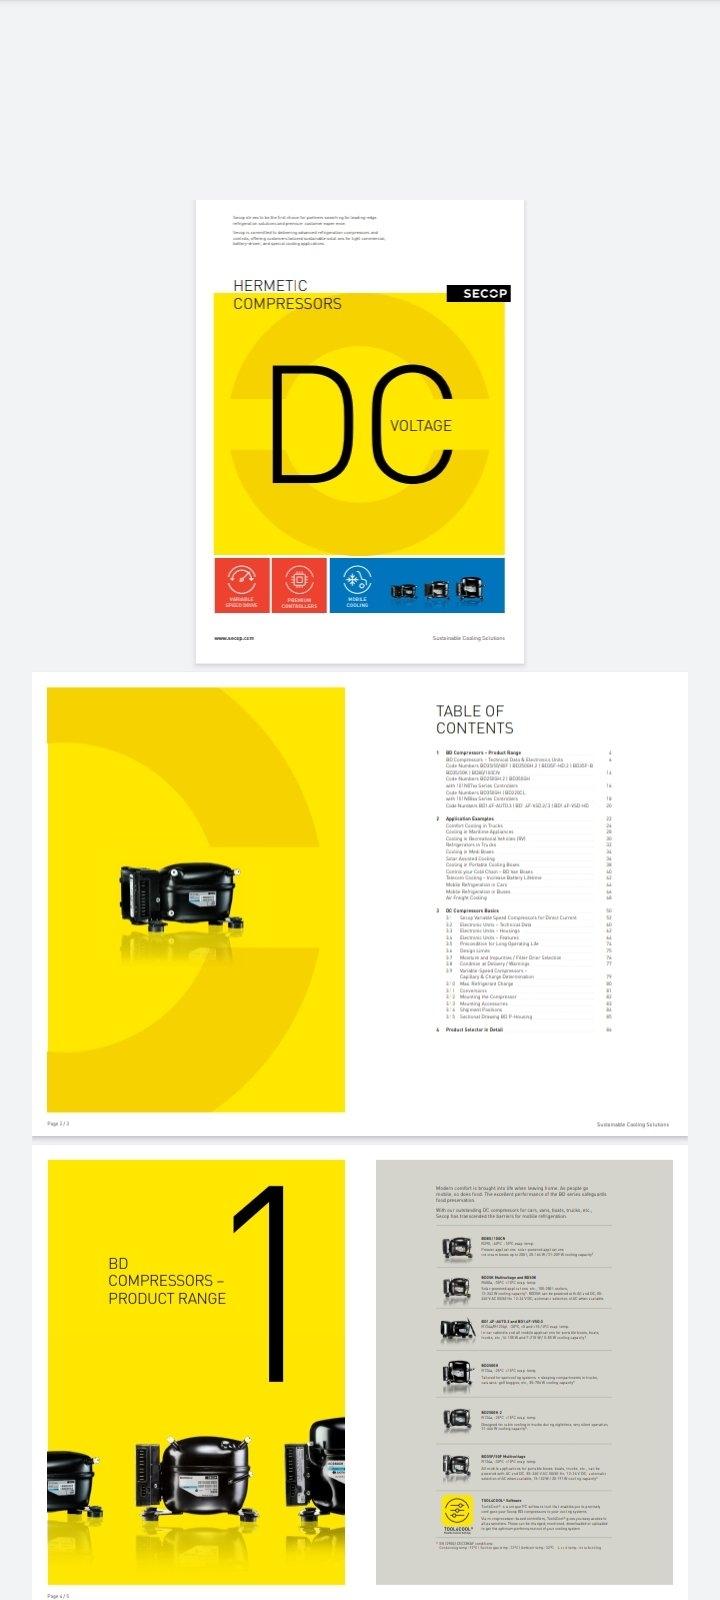 Secop New Catalog on DC Voltage hermetic compressors